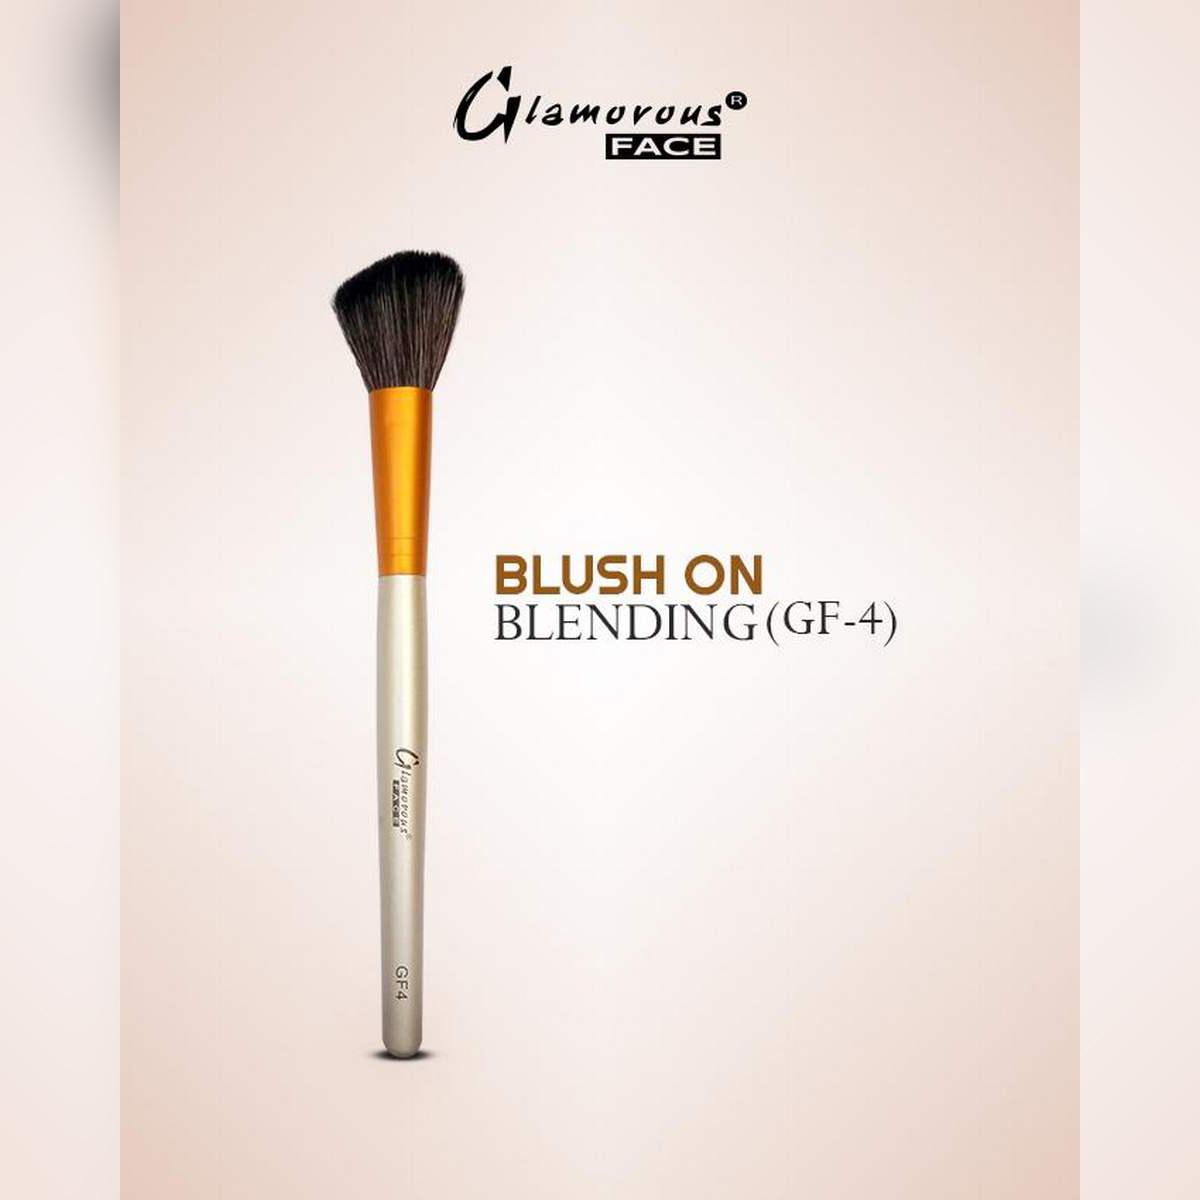 Blush On Blending Soft Gf-4